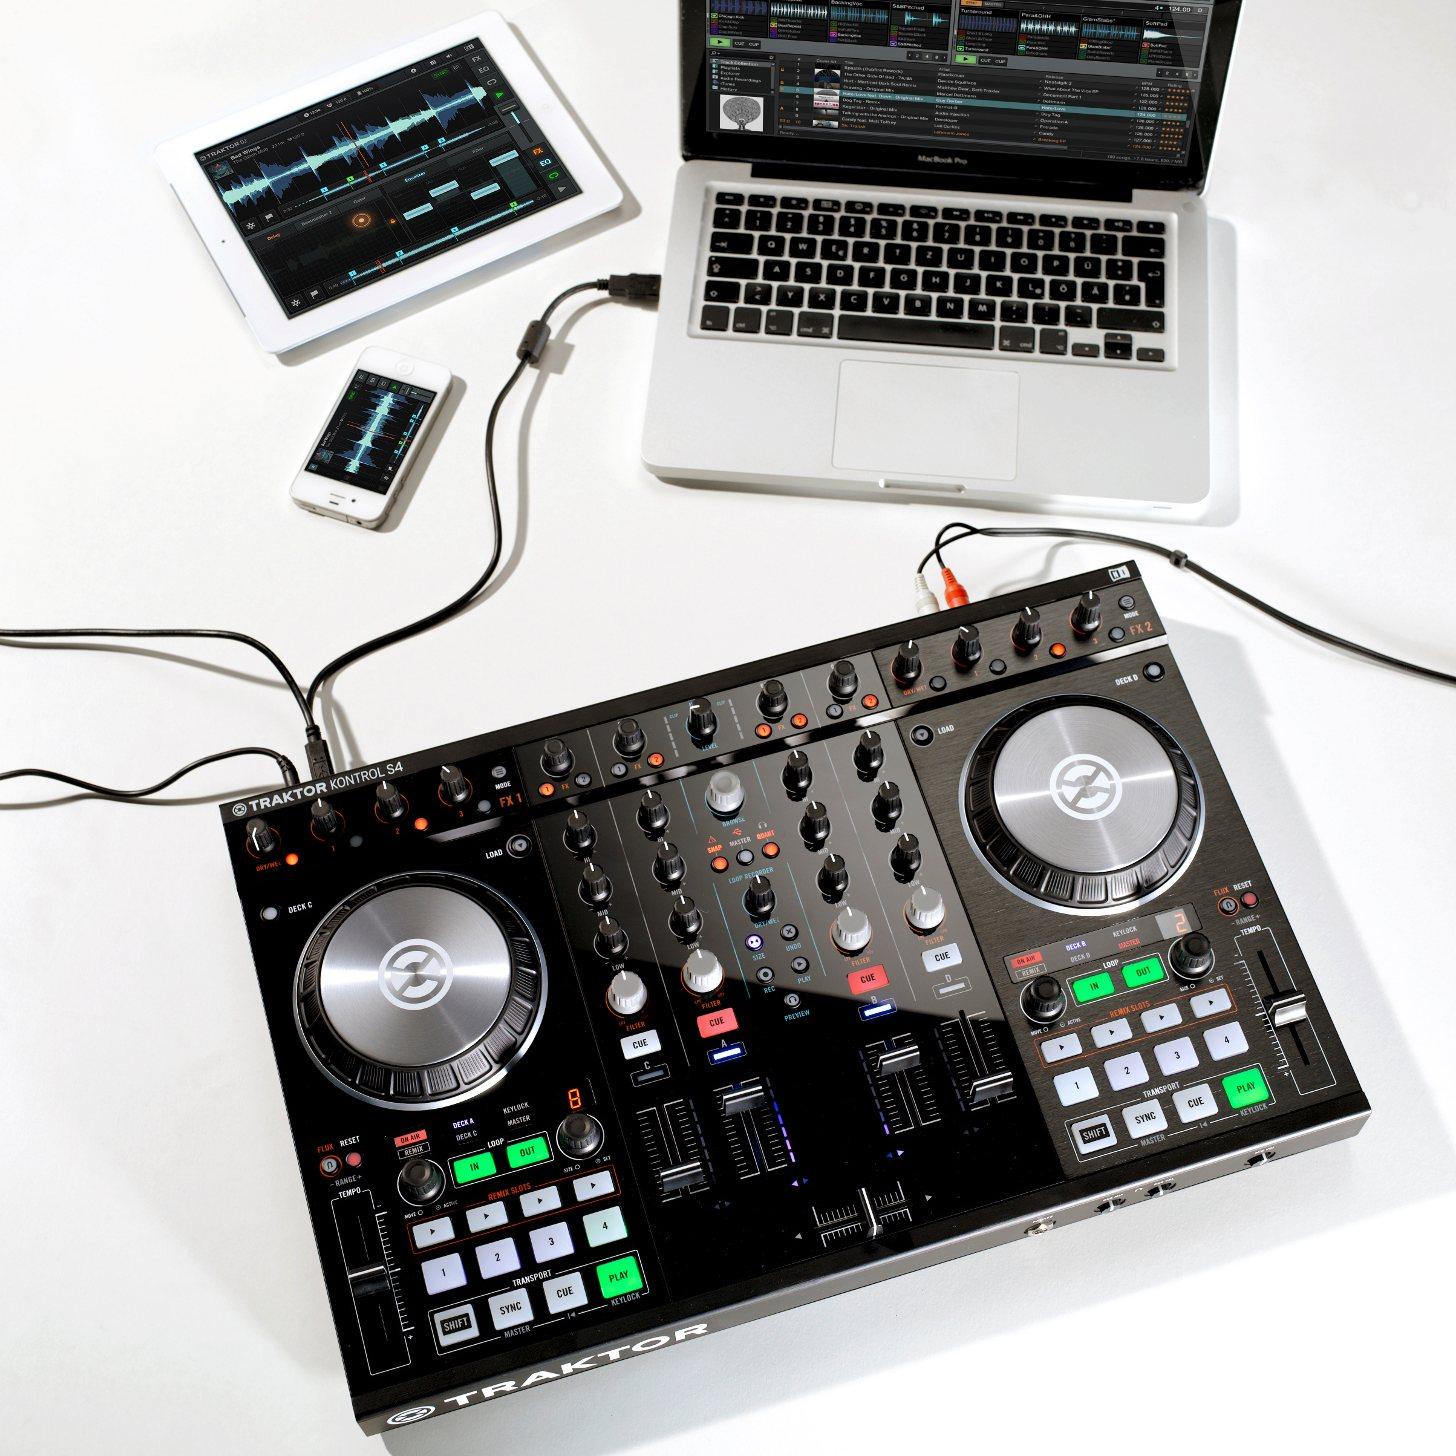 Laptop or iPad DJ? What If It Didn't Matter? New NI Hardware